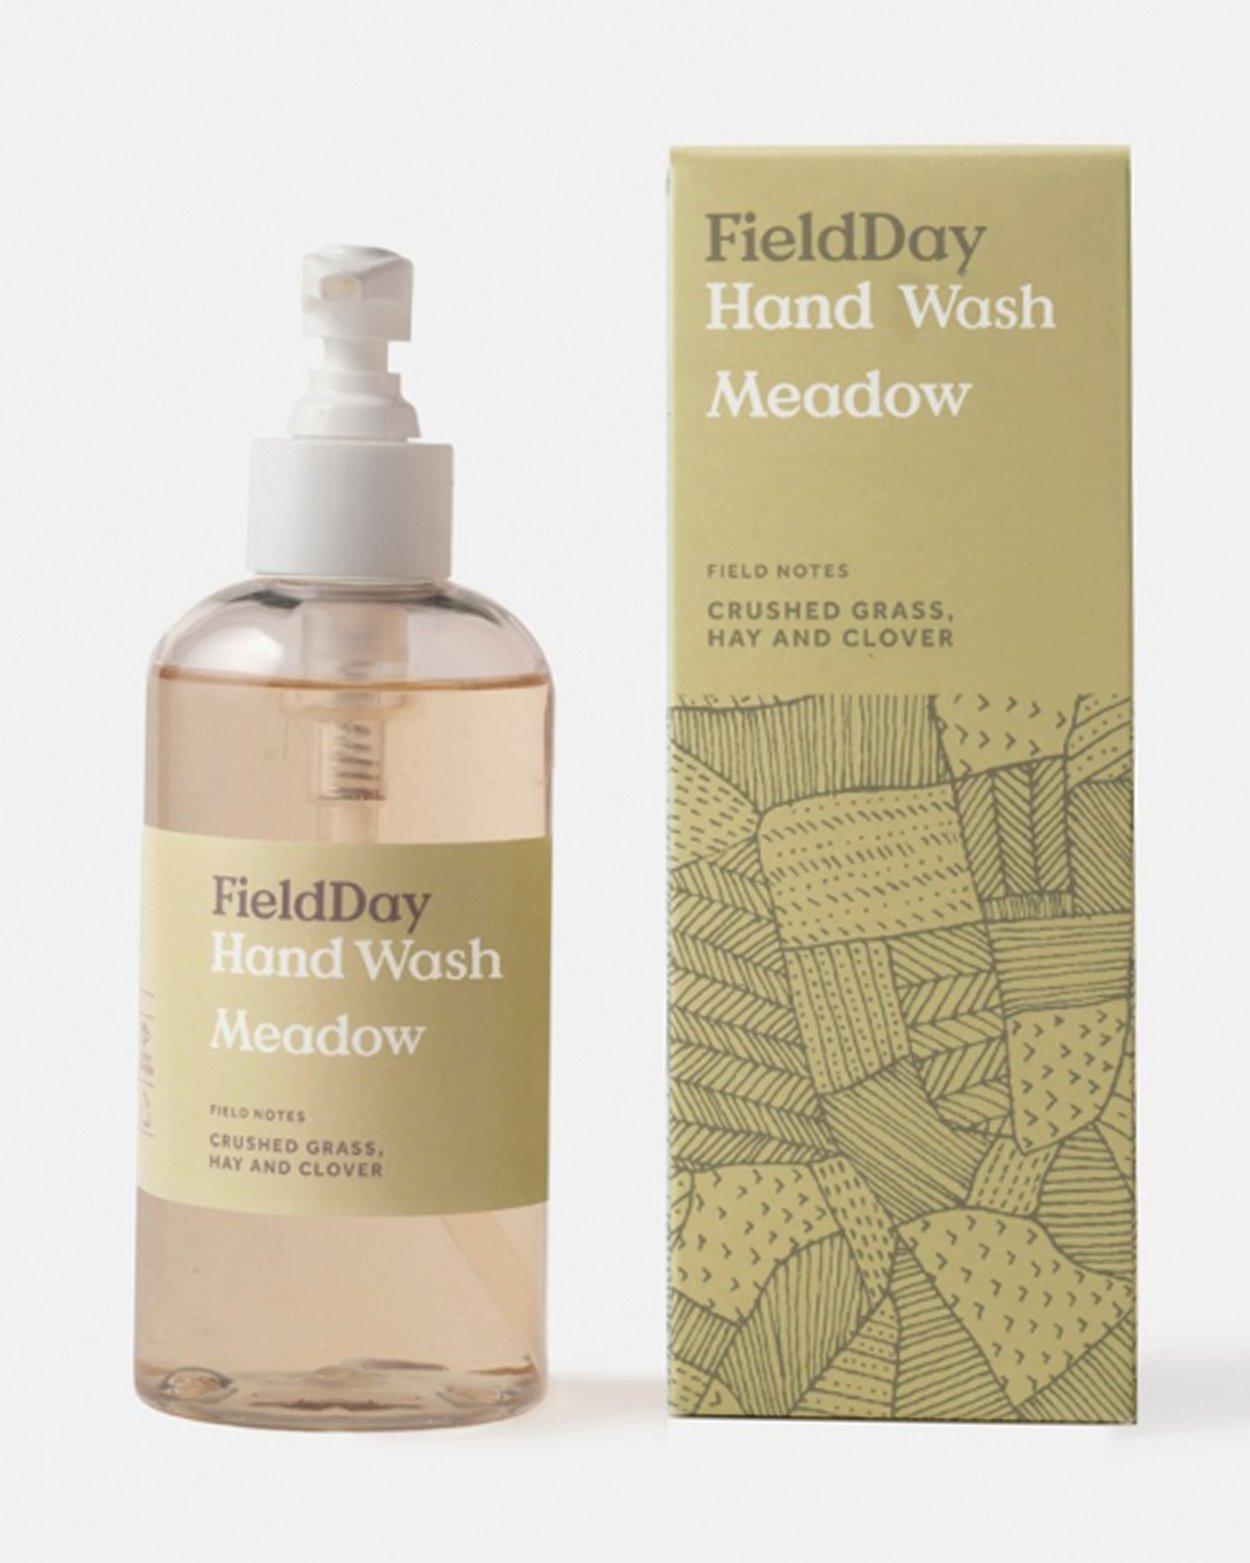 Meadow Hand Wash